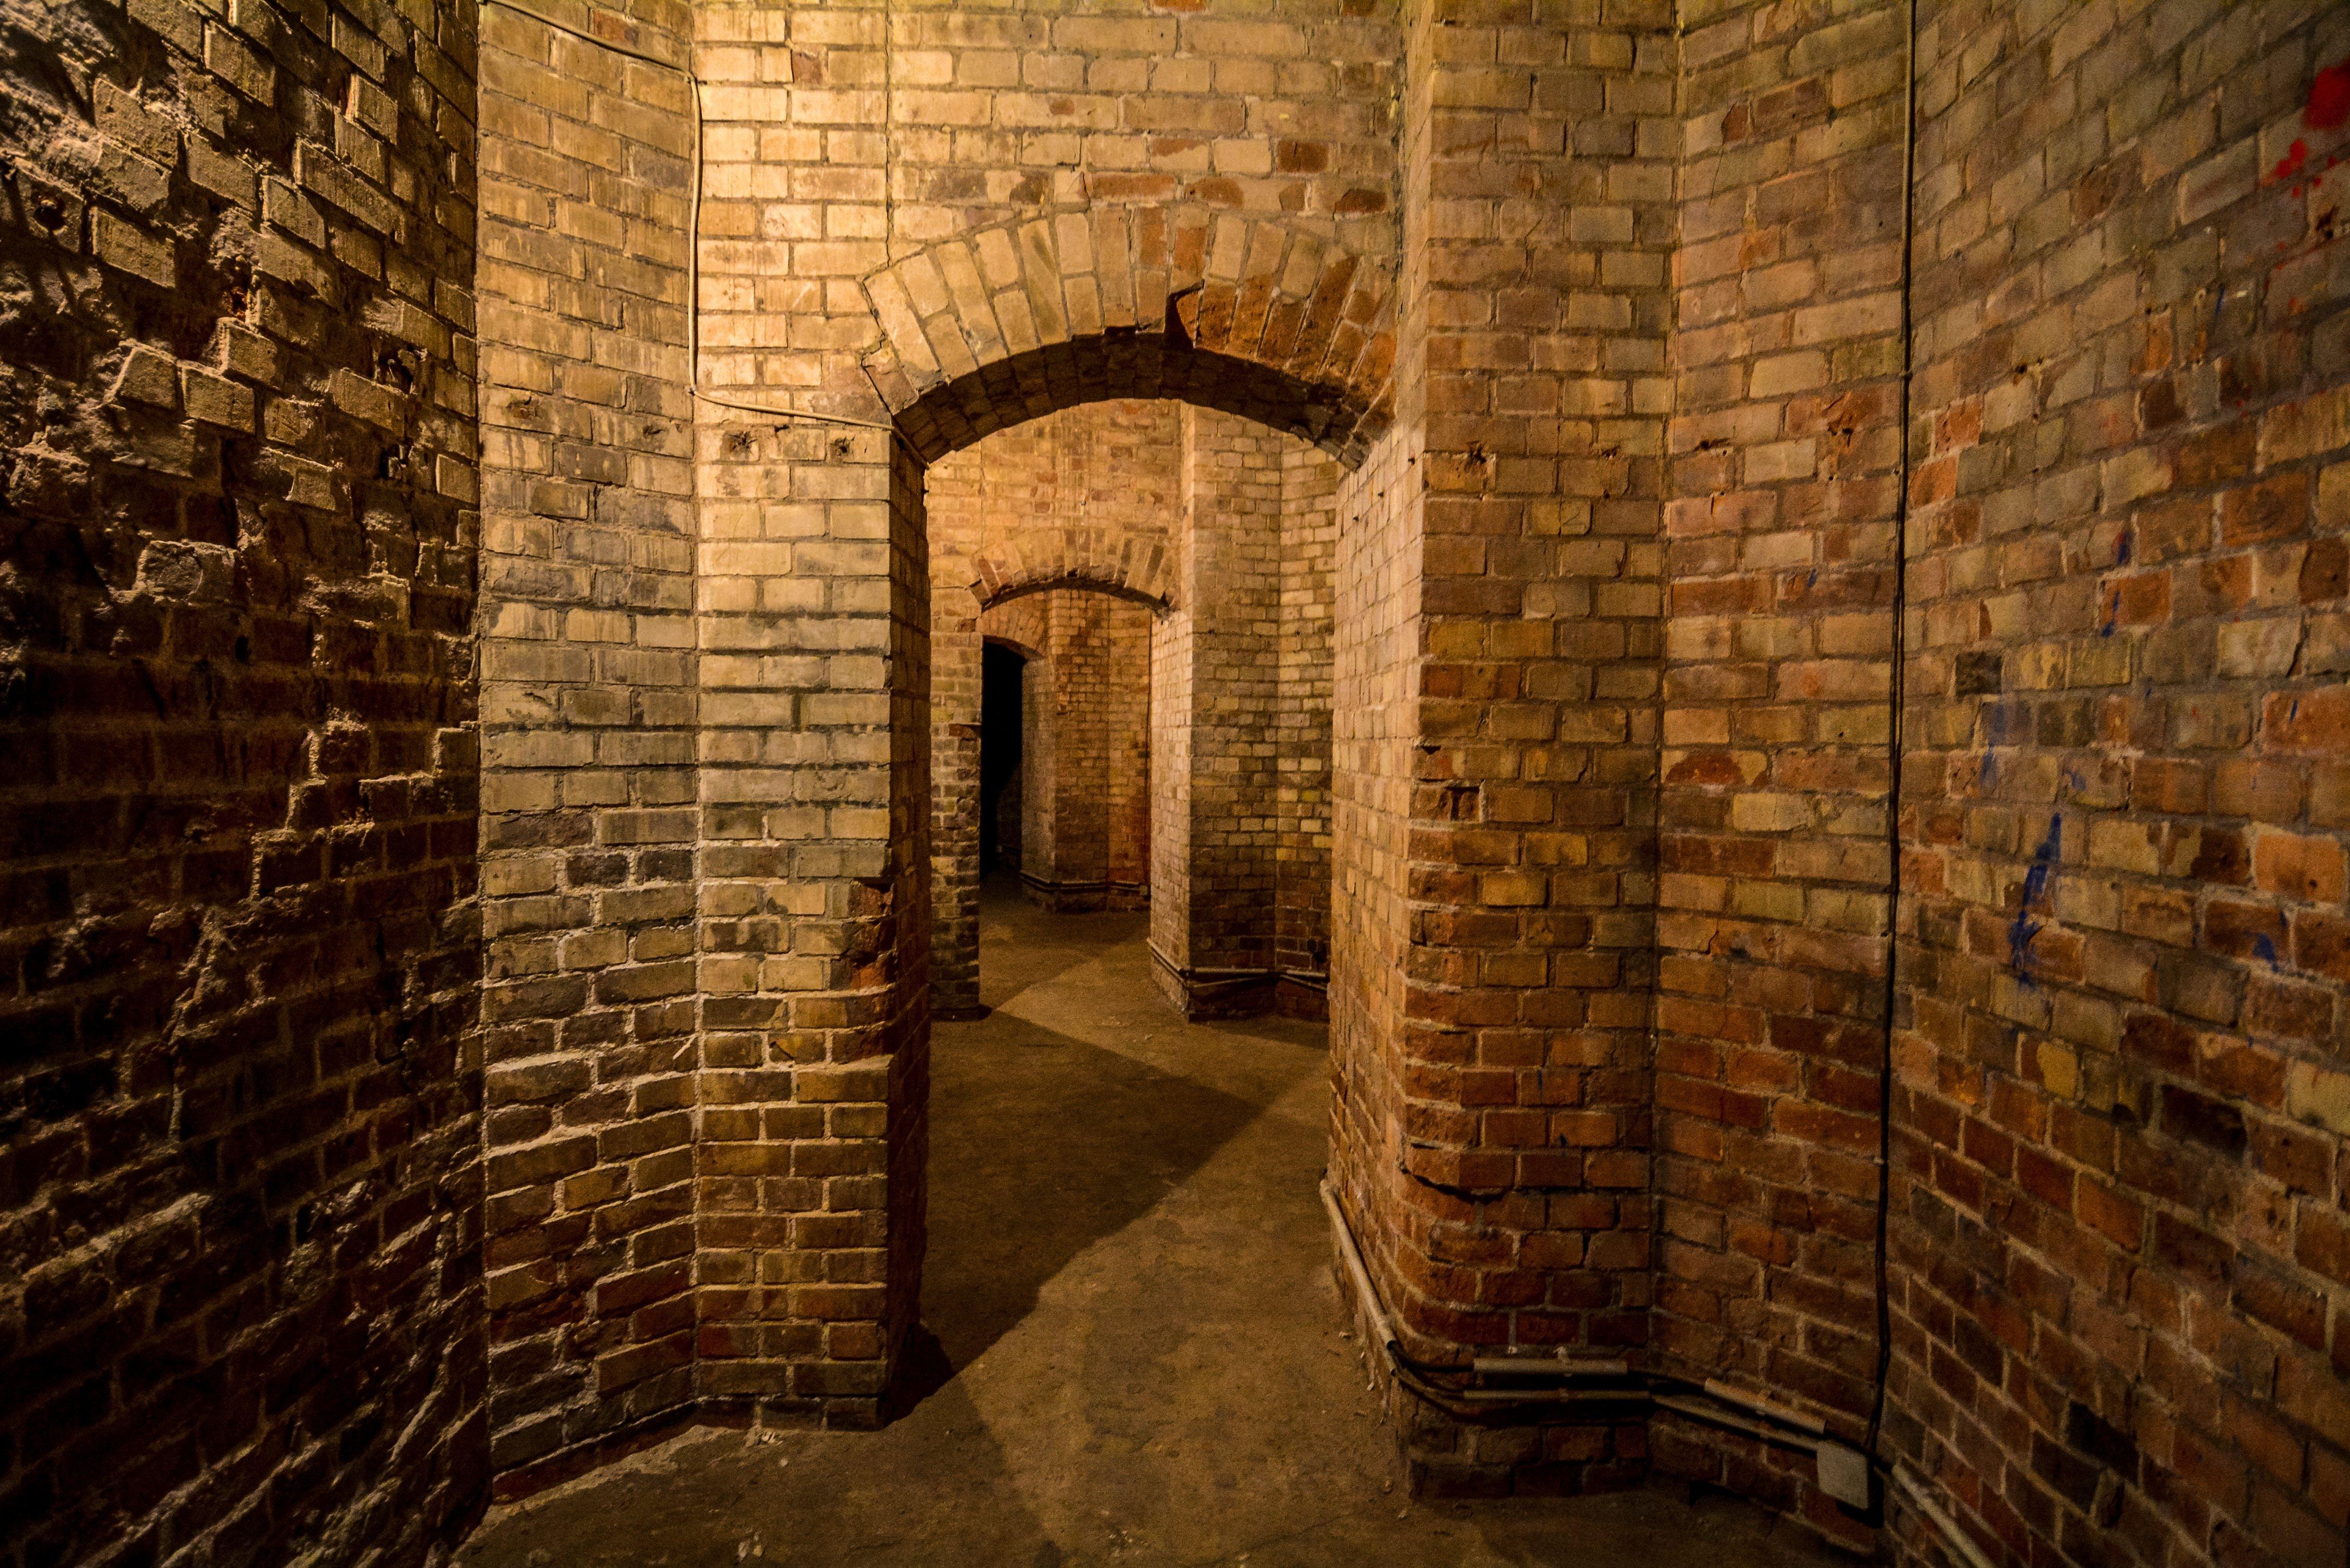 berlin prenzlauer berg wasserturm water tower large water reservoir interior catacombs